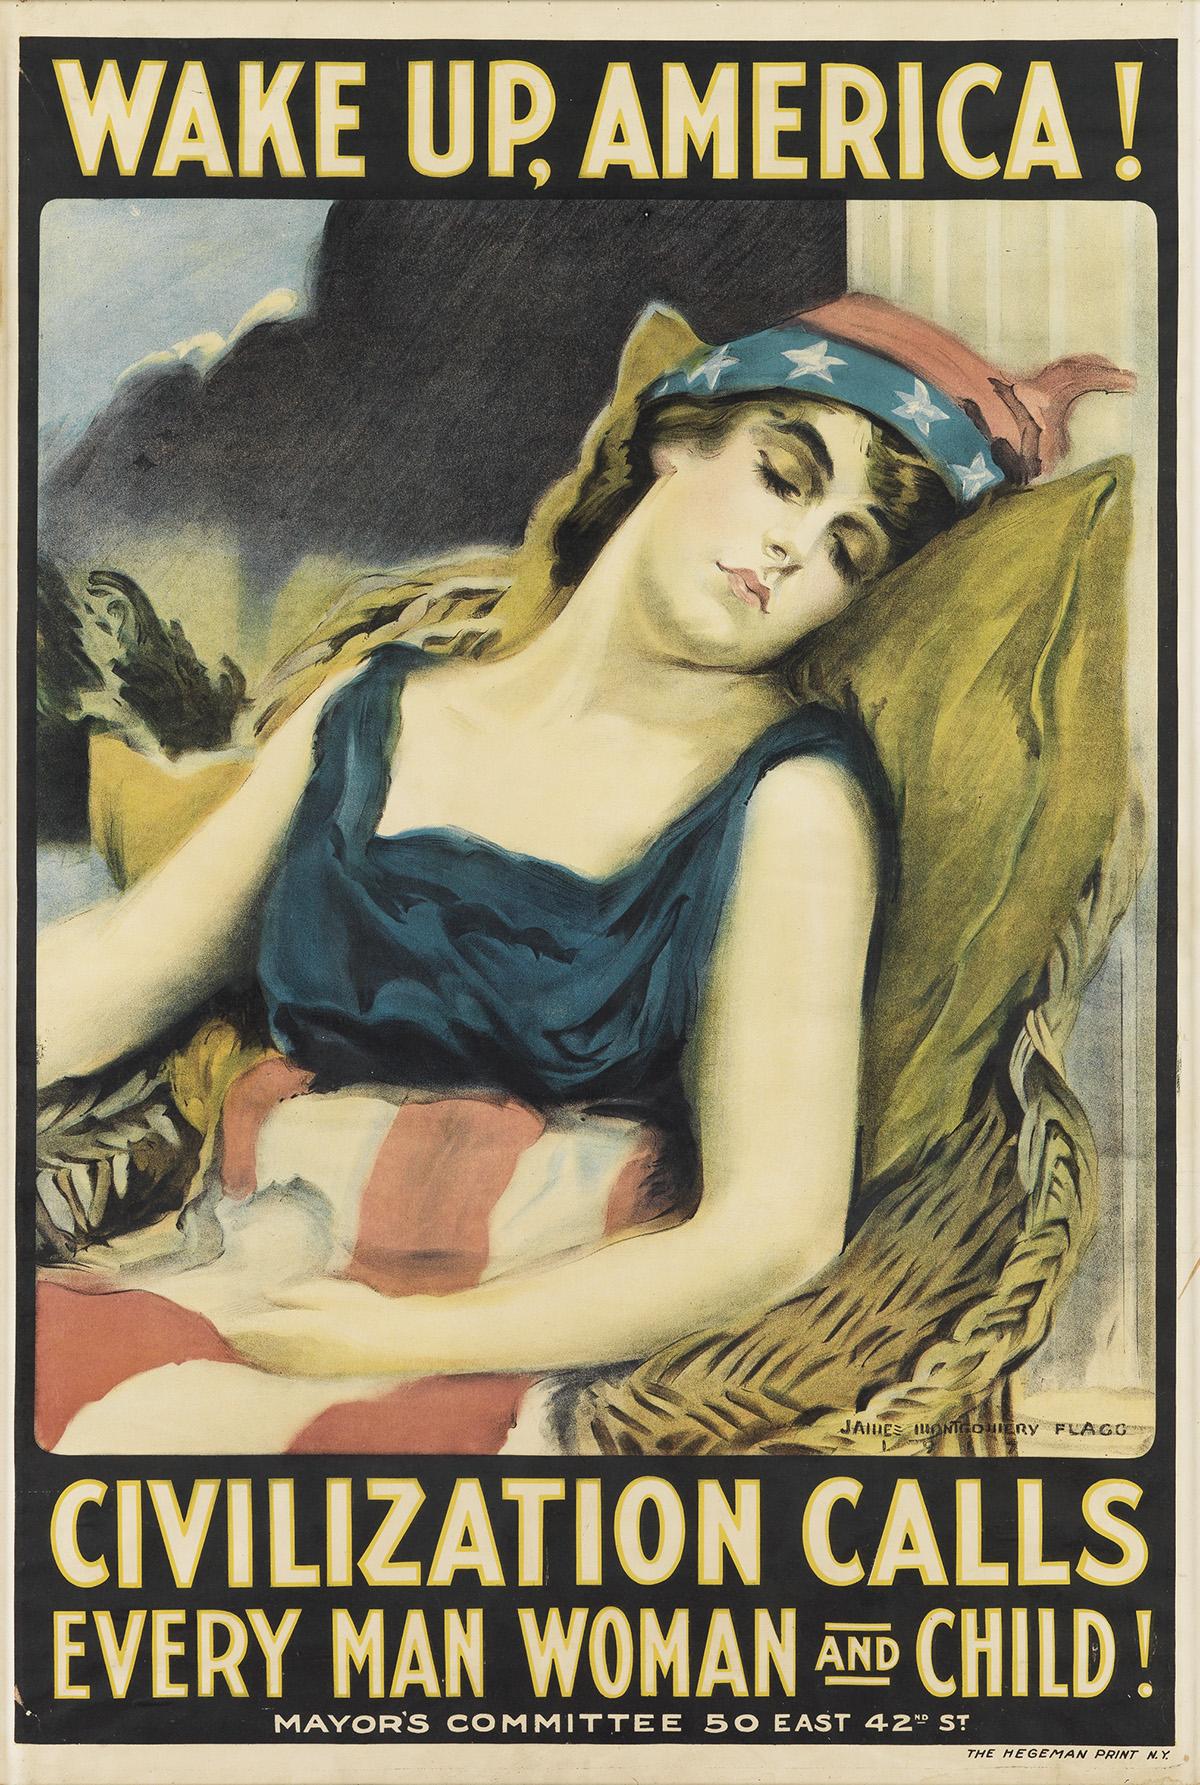 JAMES MONTGOMERY FLAGG (1870-1960). WAKE UP, AMERICA! / CIVILIZATION CALLS. 1917. 40x27 inches, 103x68 cm. The Hegeman Print, New York.